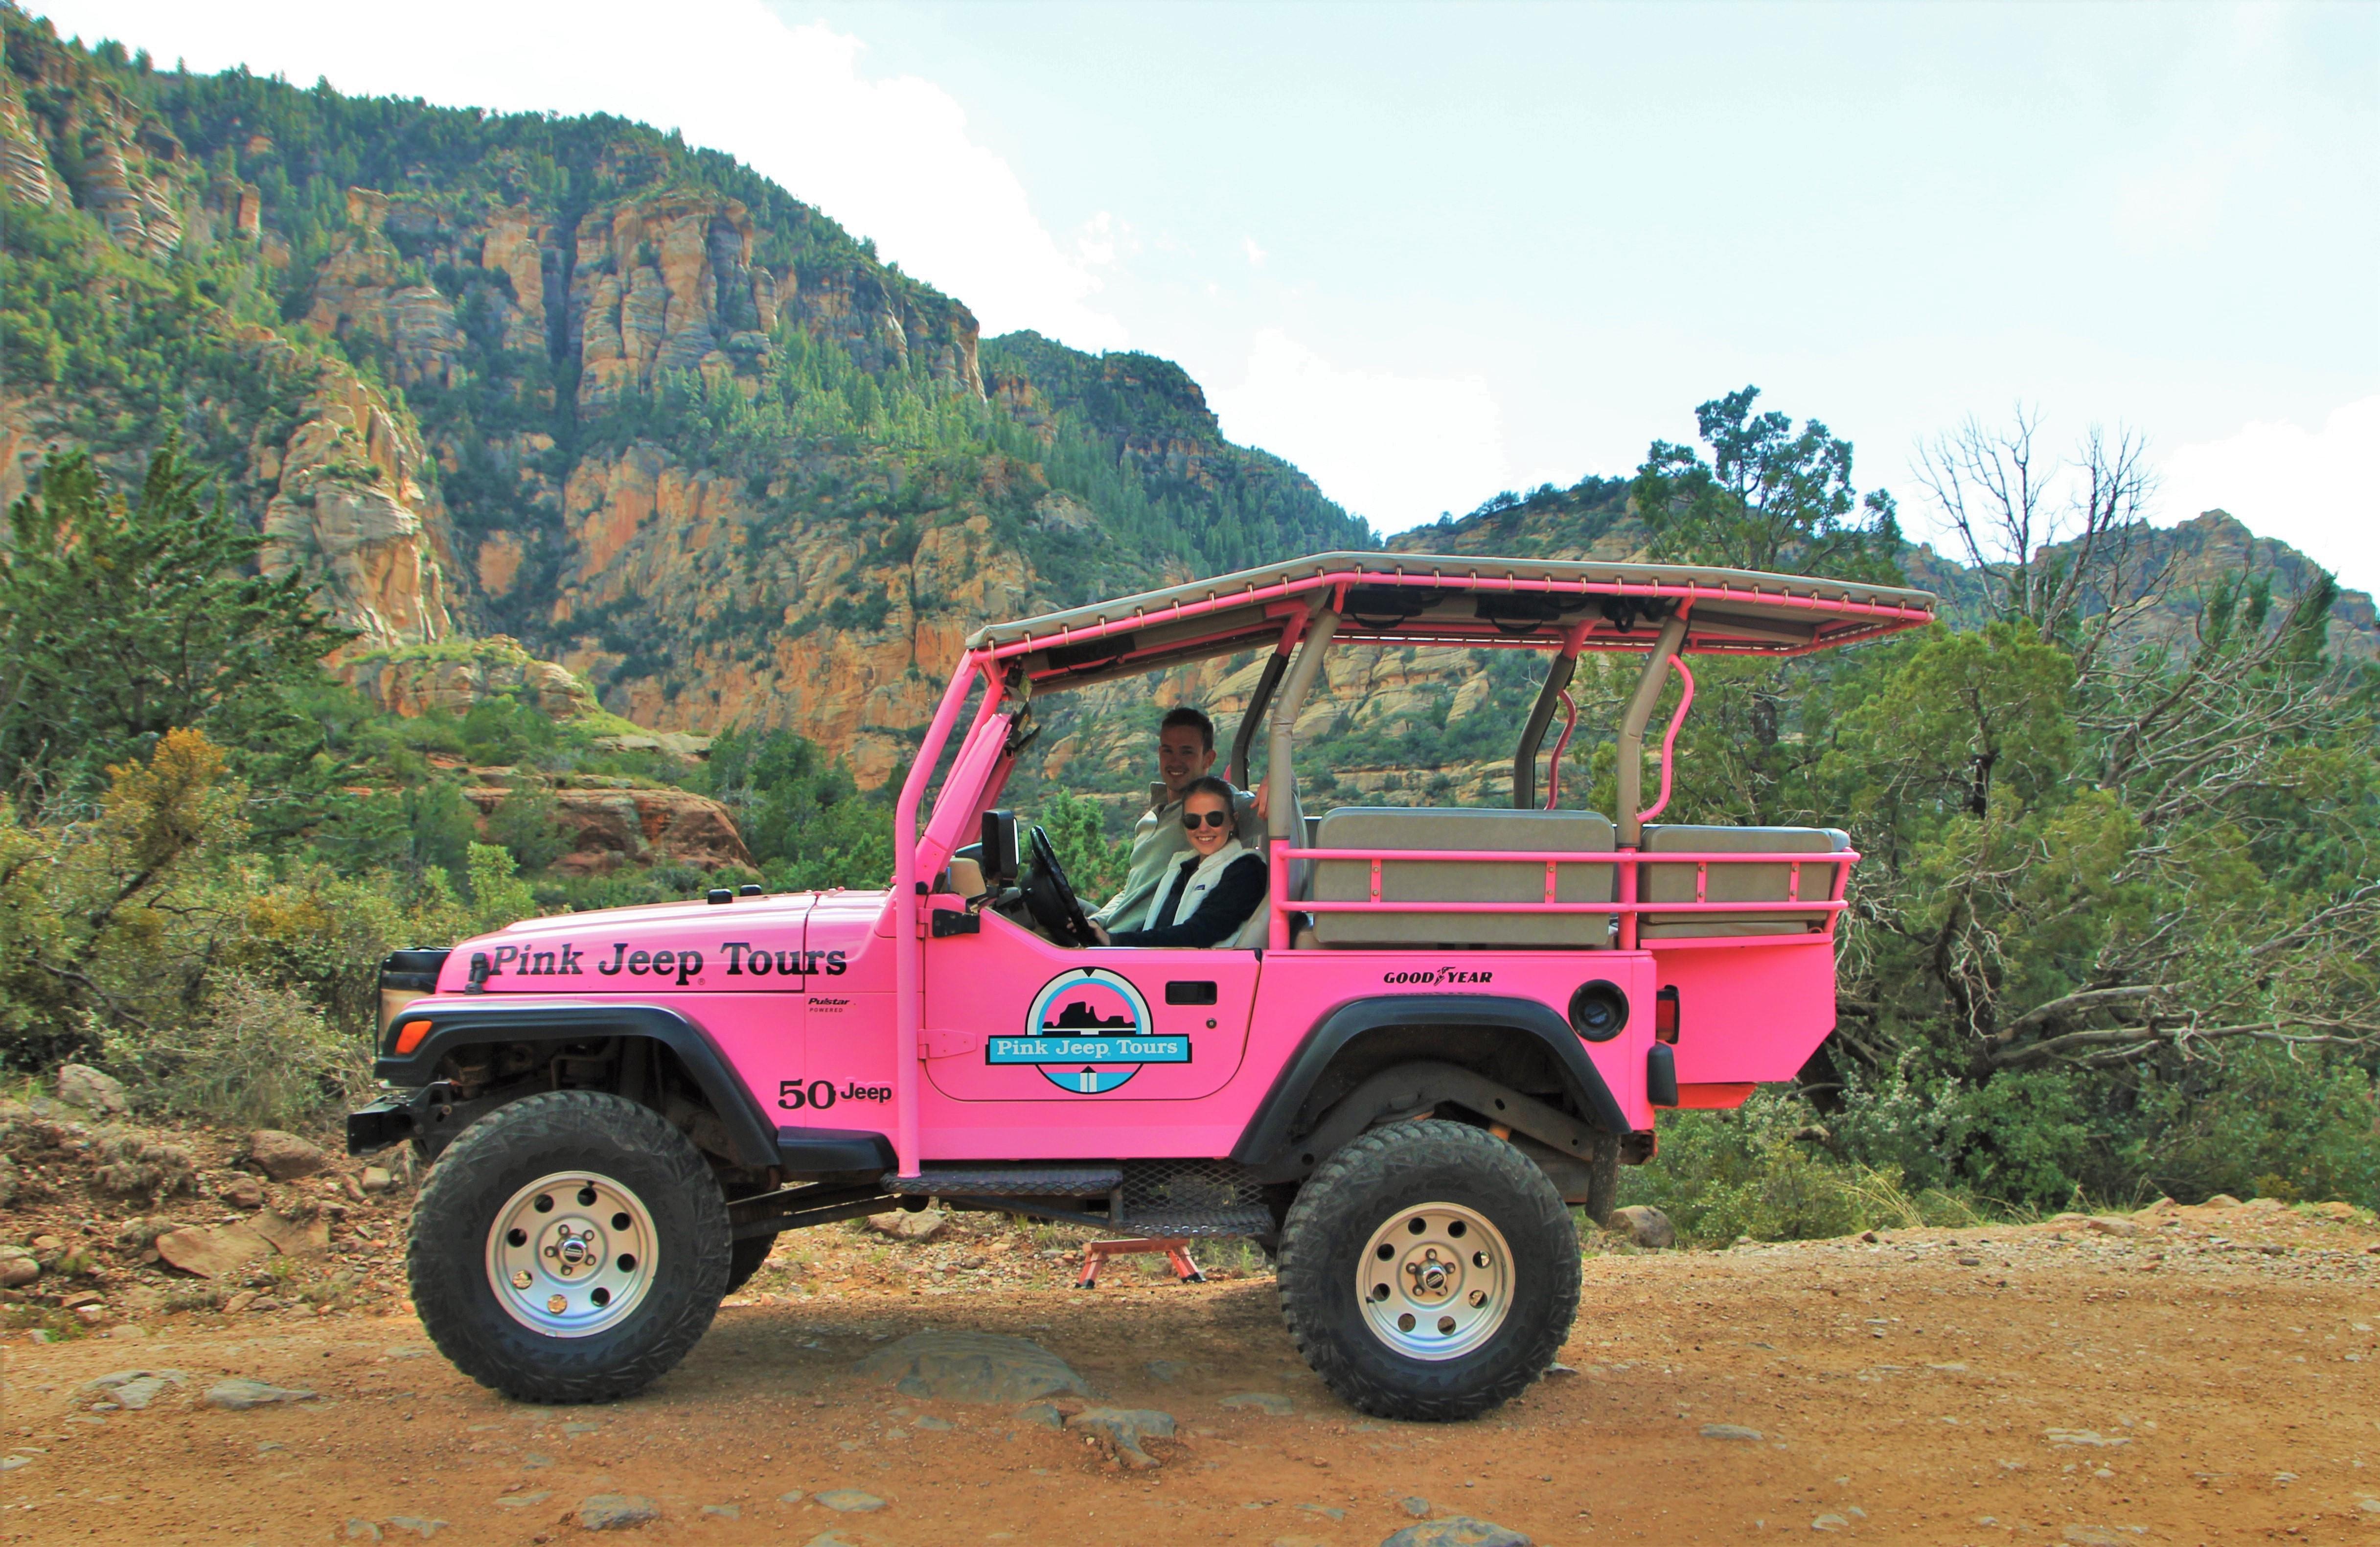 Pink jeep 4x4 Sedona